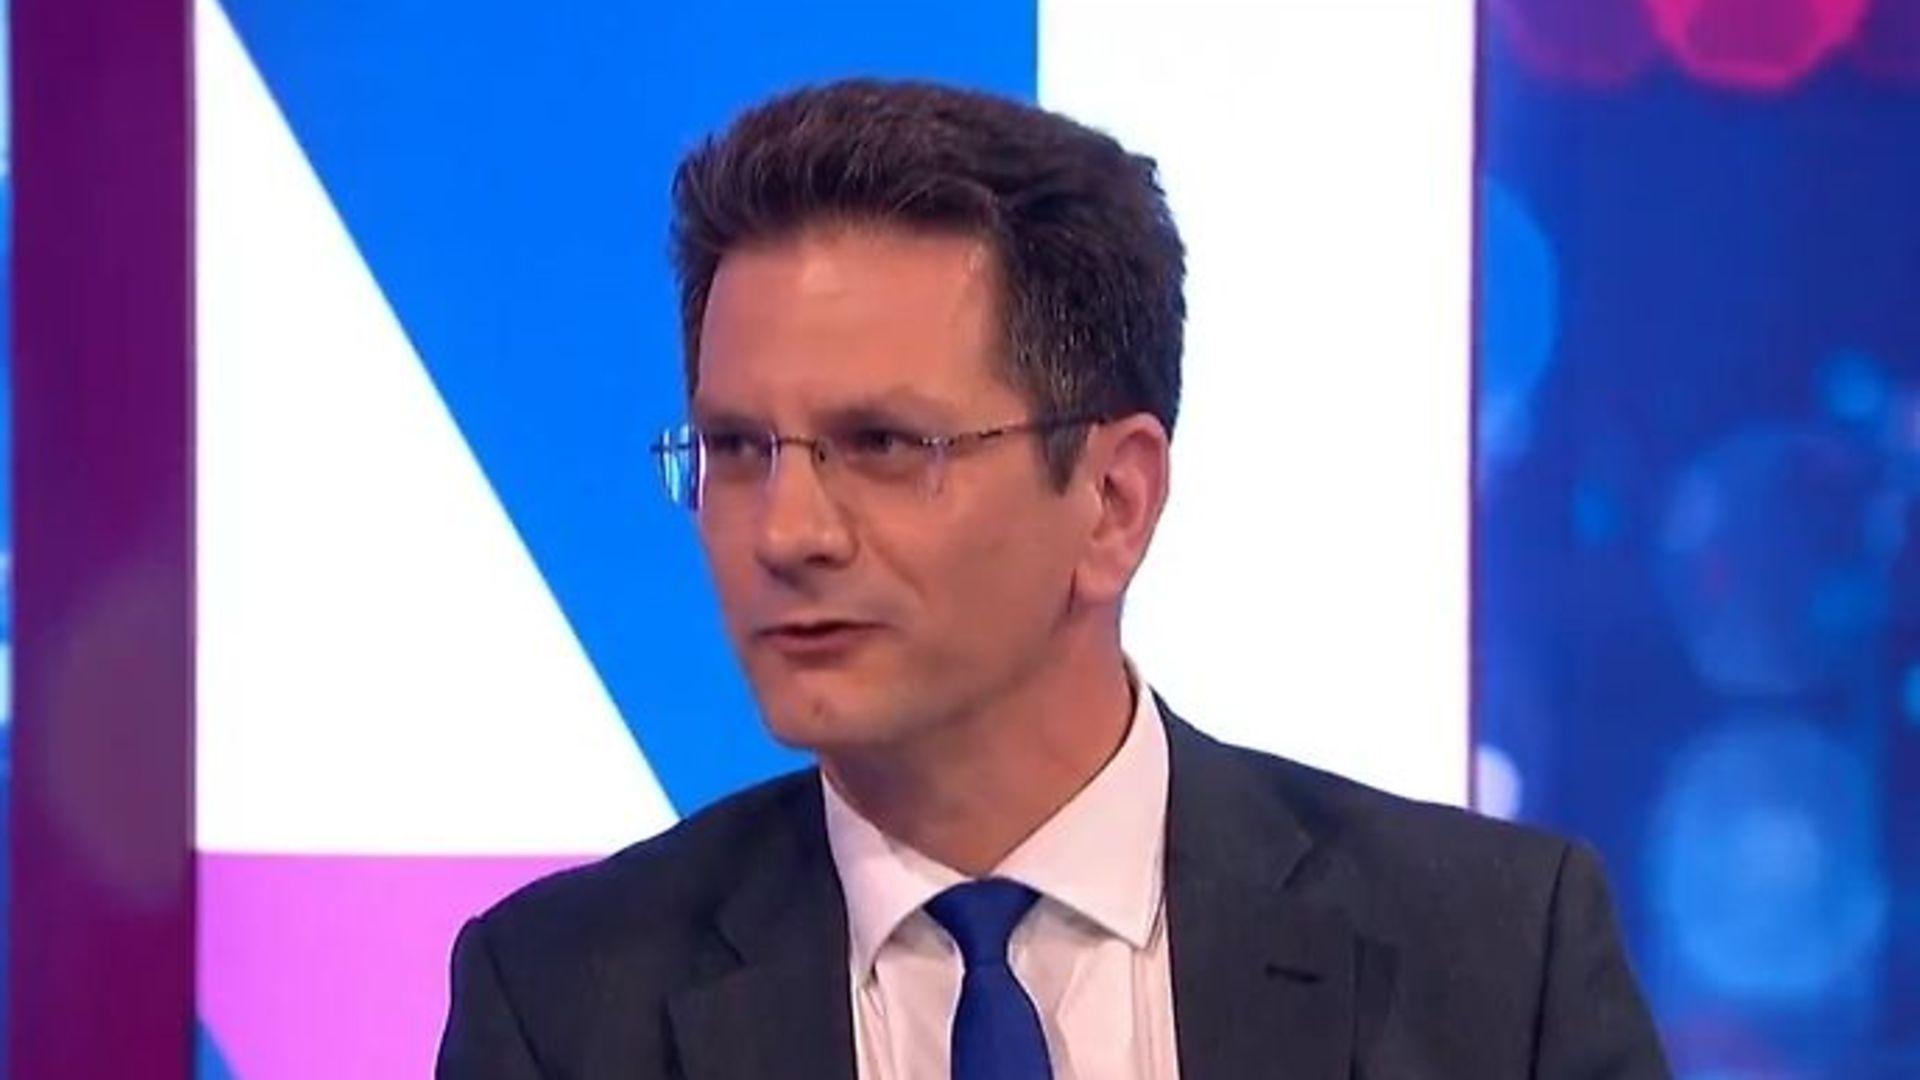 Tory backbencher Steve Baker said he is 'organising people' to rebel against the government's latest coronavirus bill